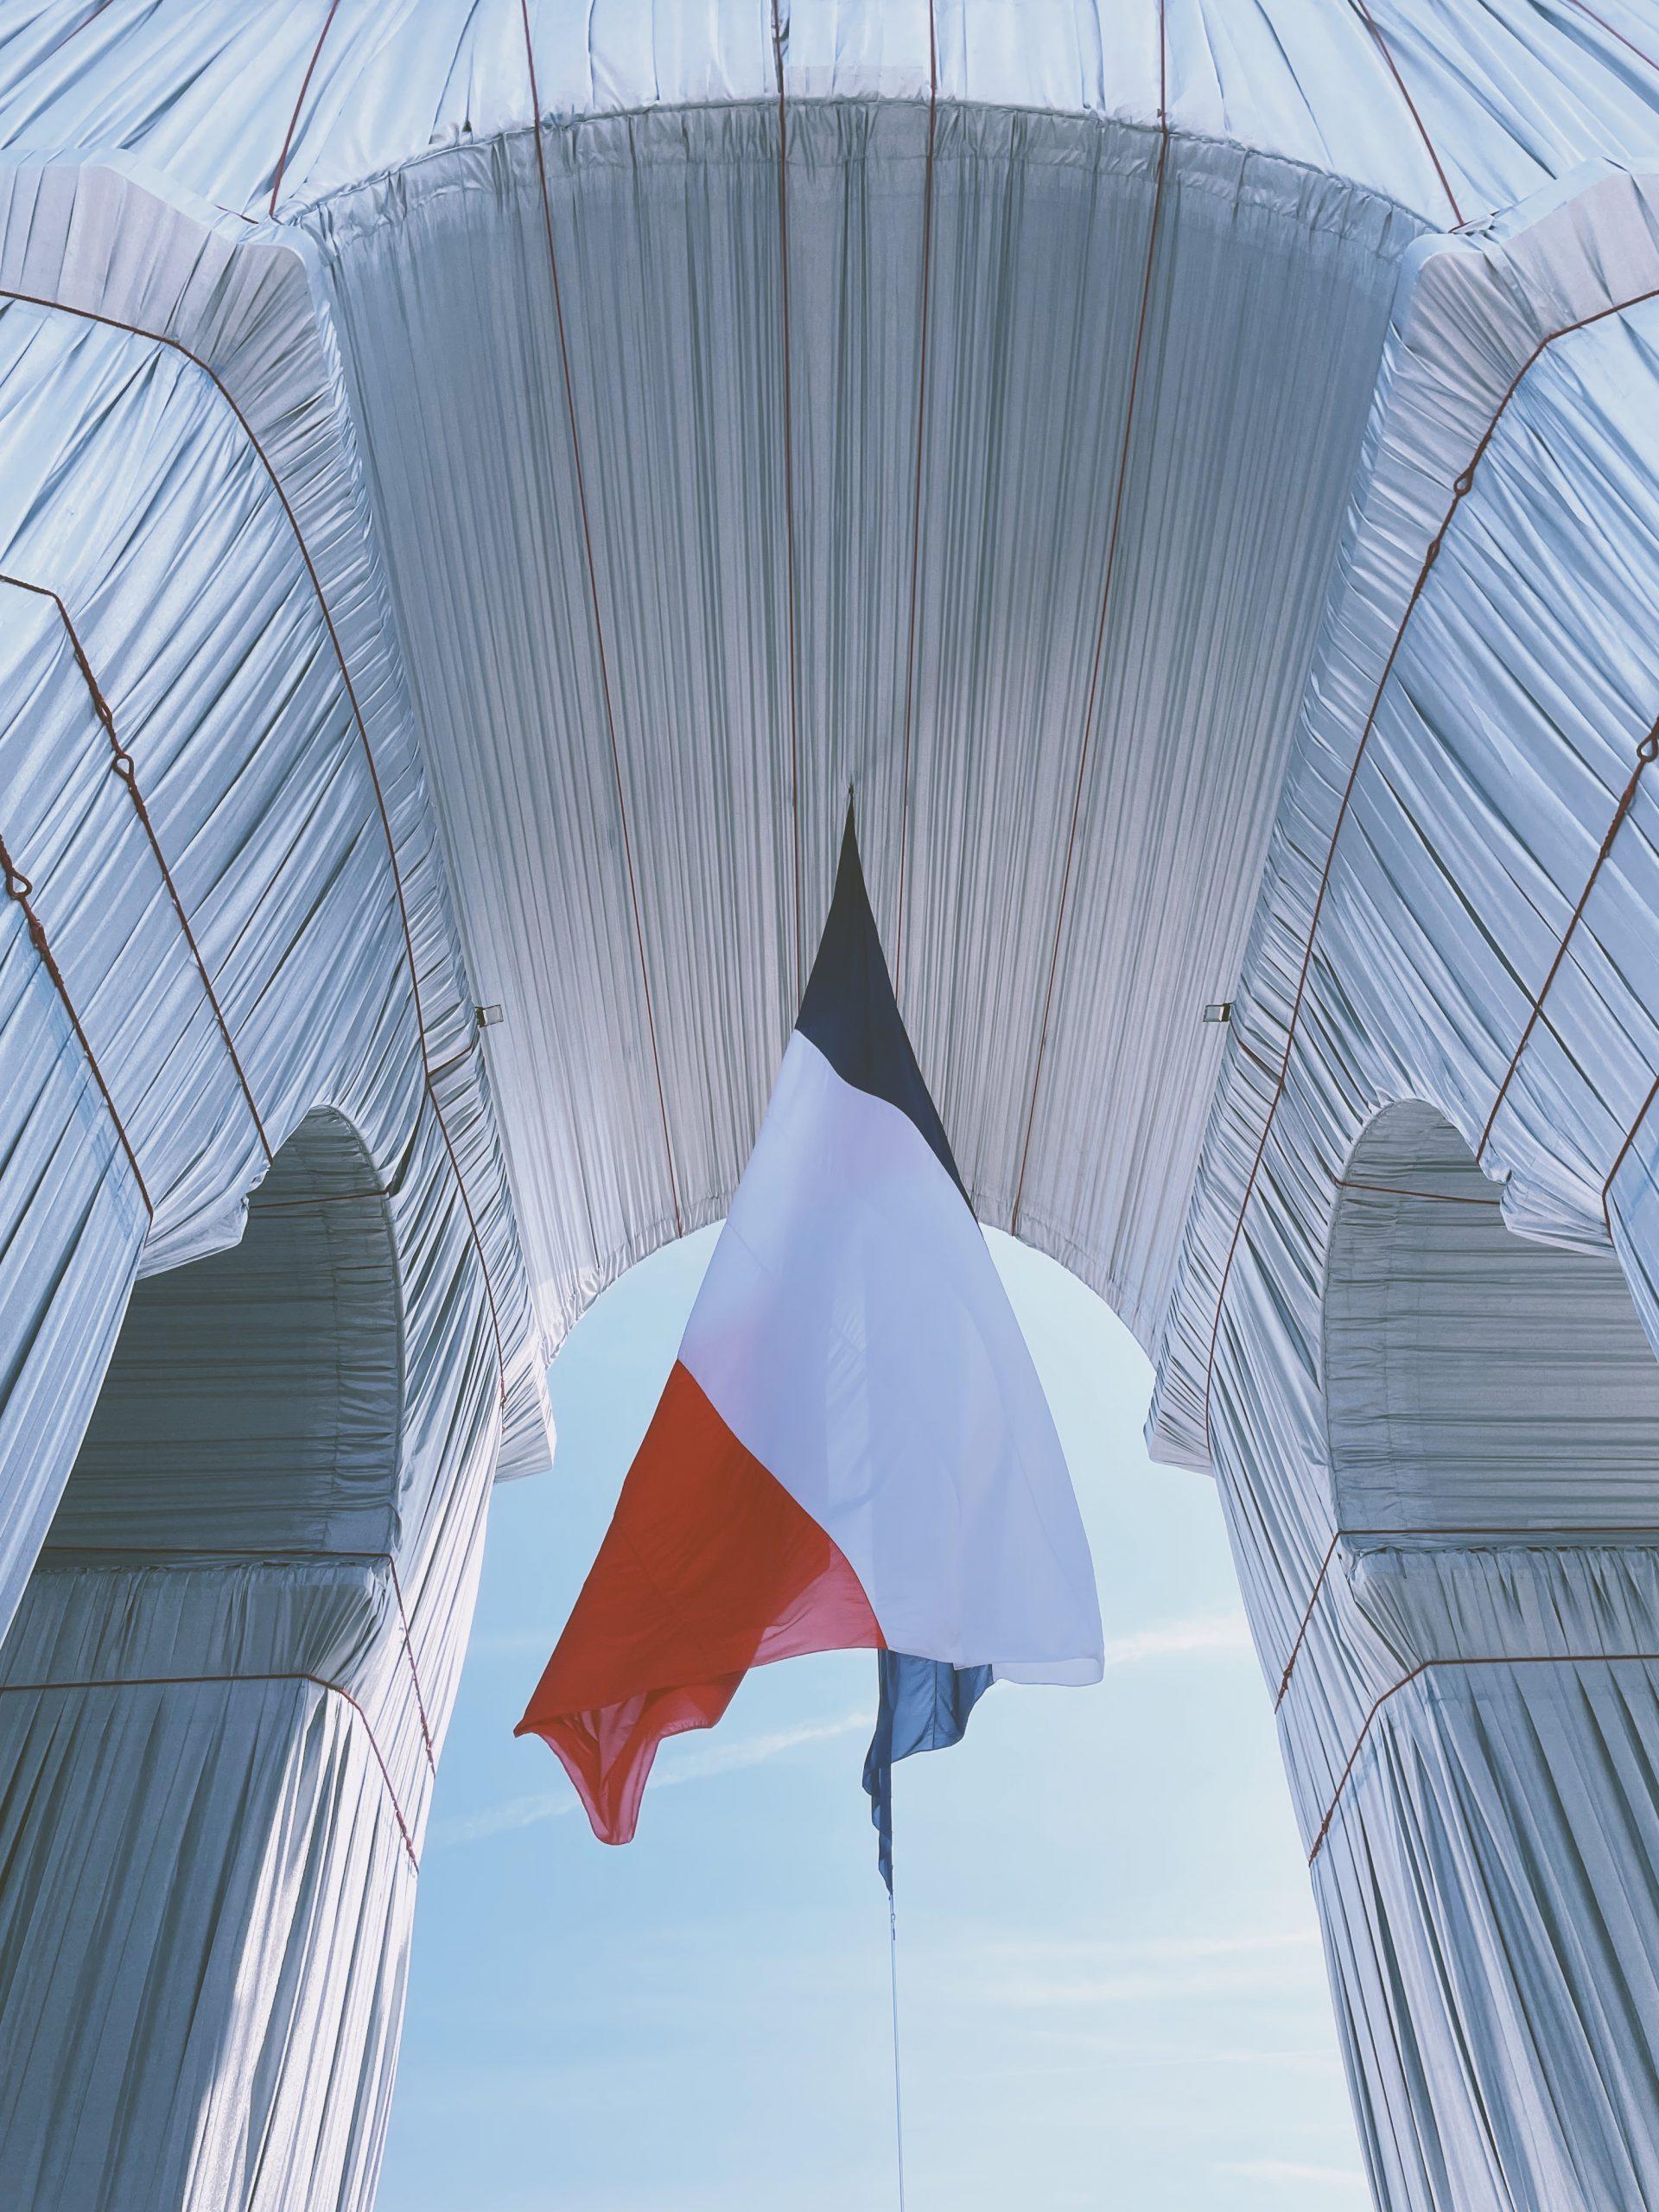 CHRISTO: L' Arc de Triomphe, Wrapped